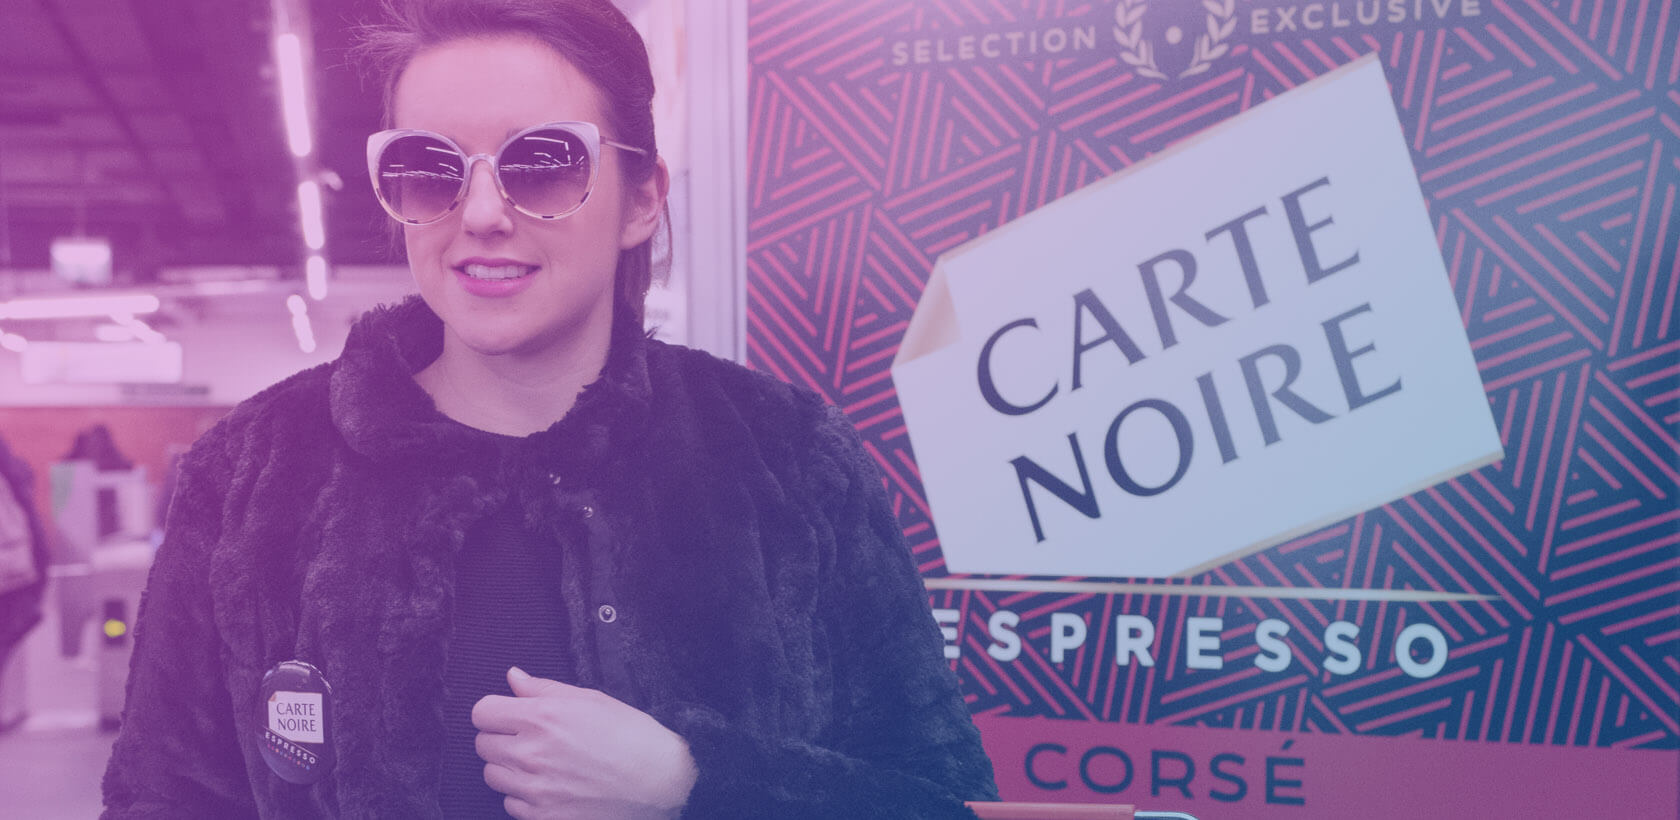 Espresso Carte Noire Street marketing - Globe